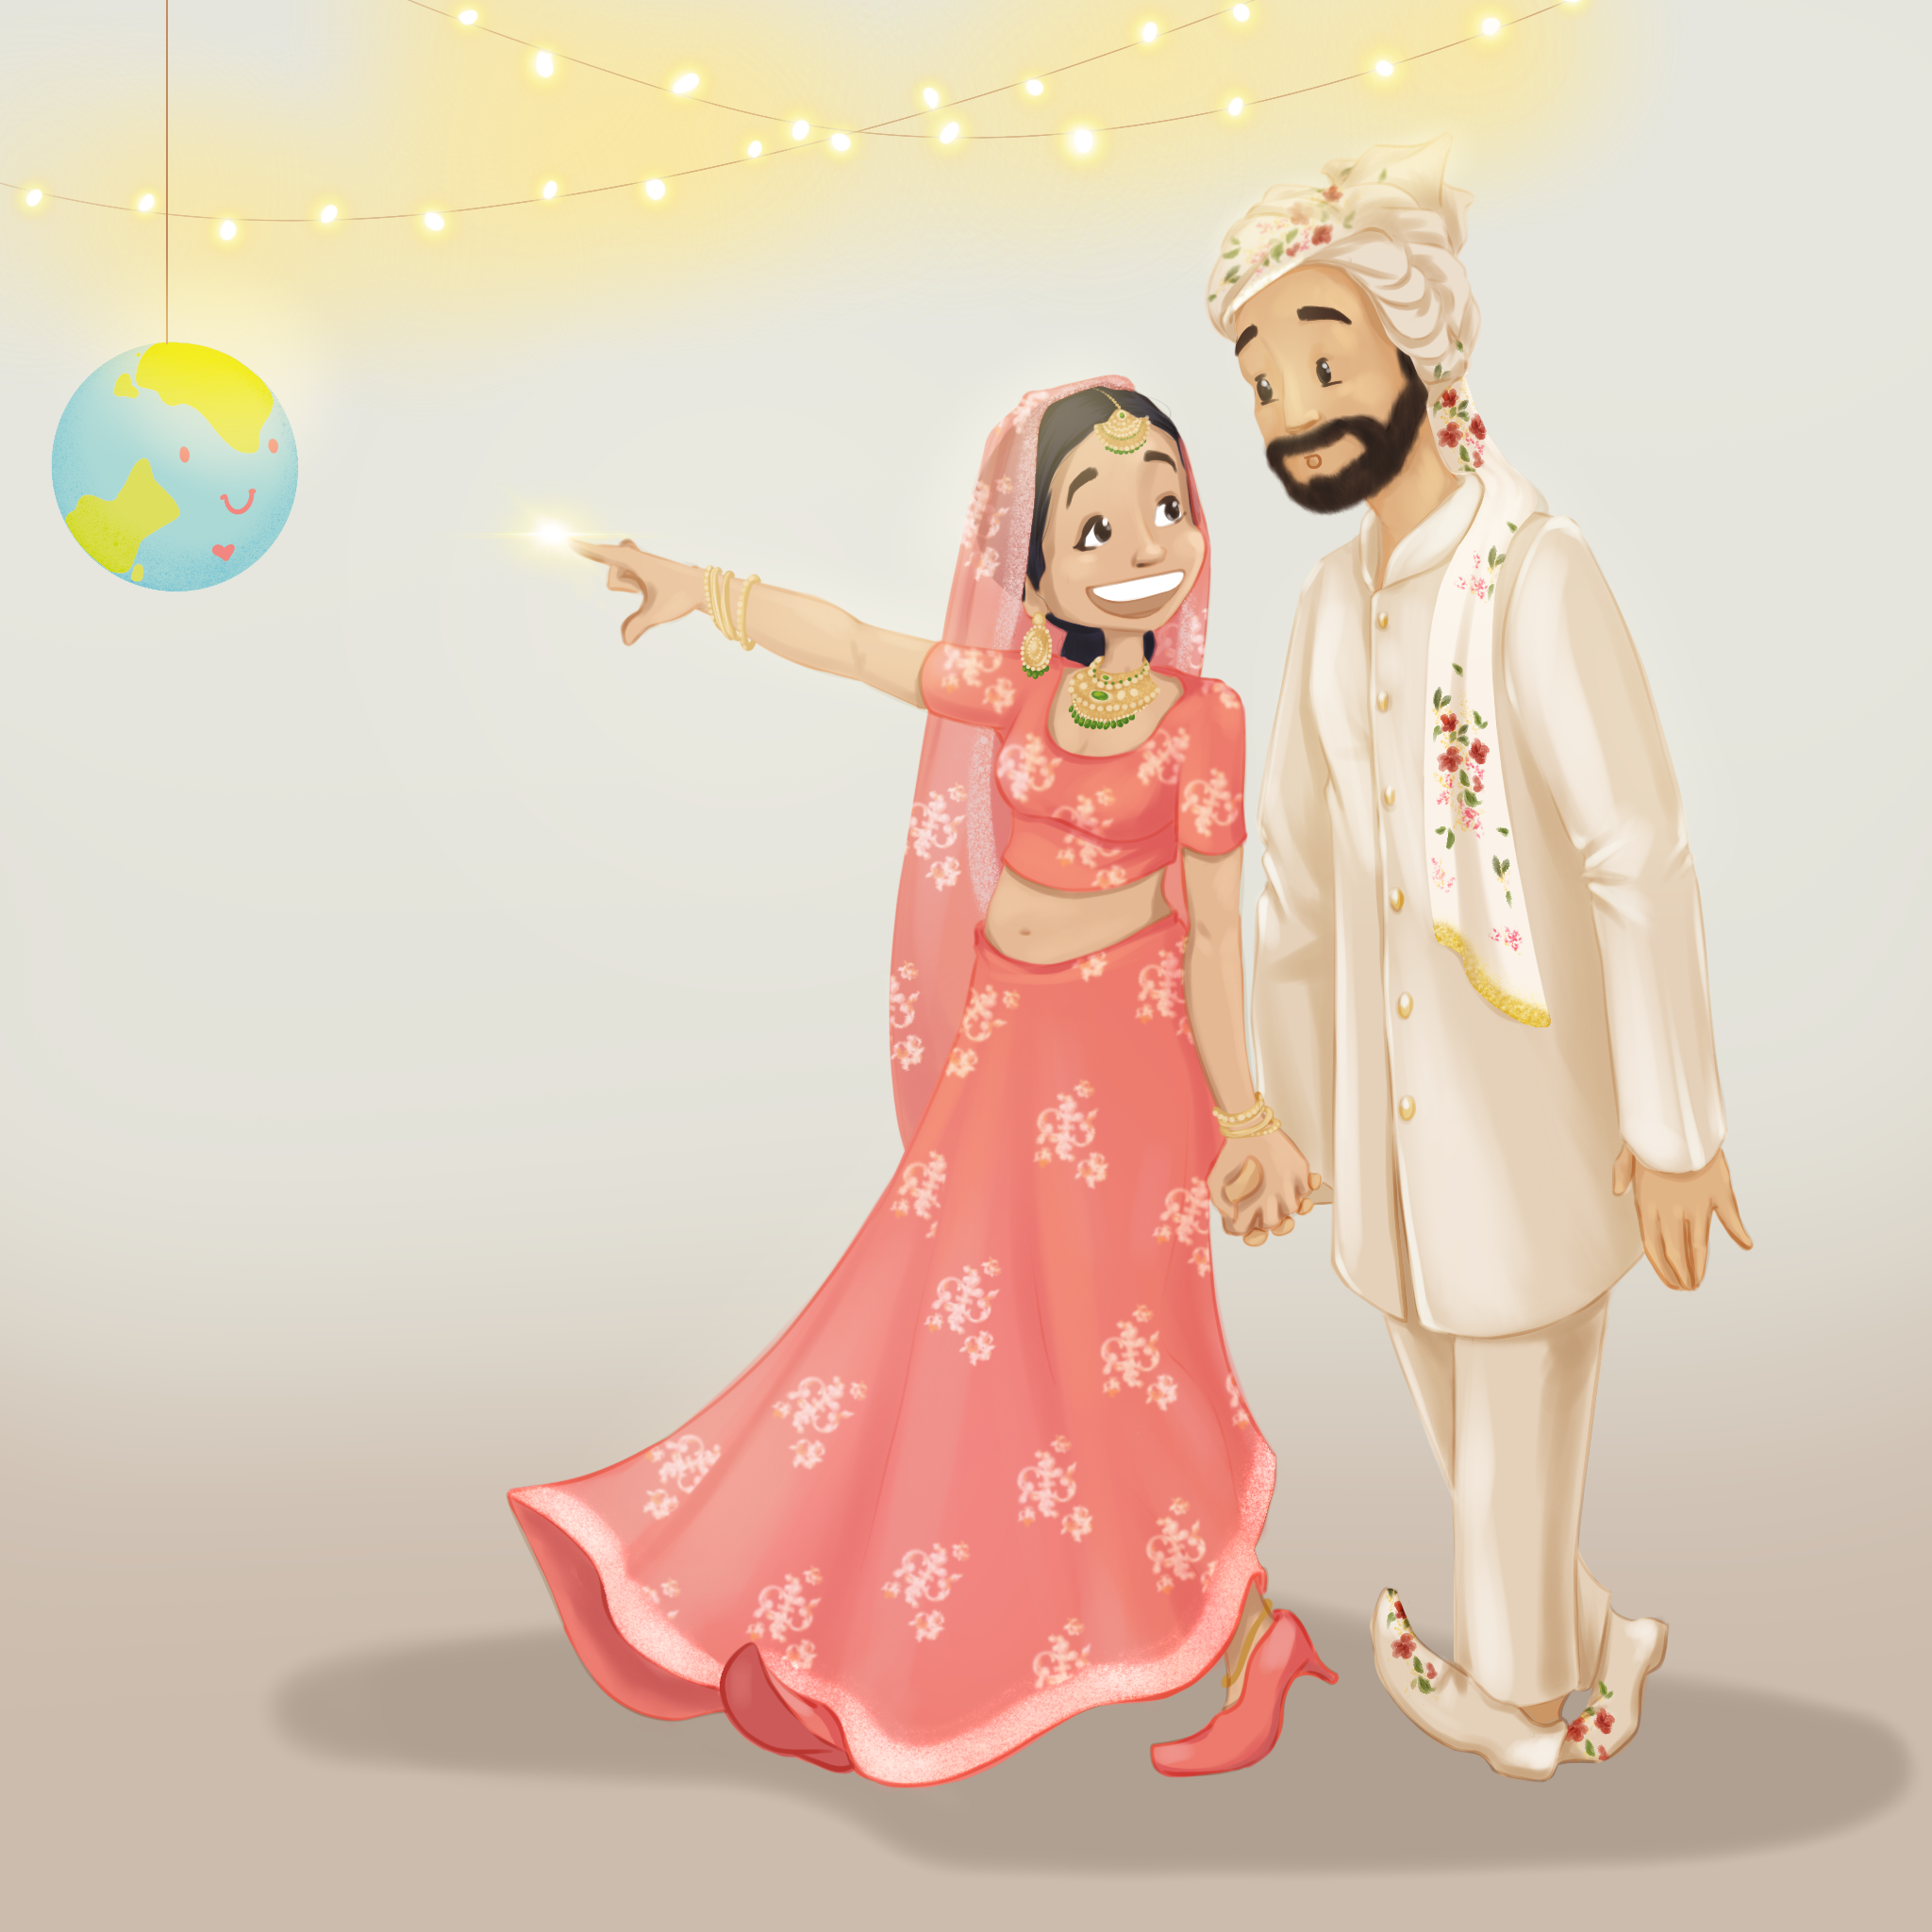 The Destination Wedding